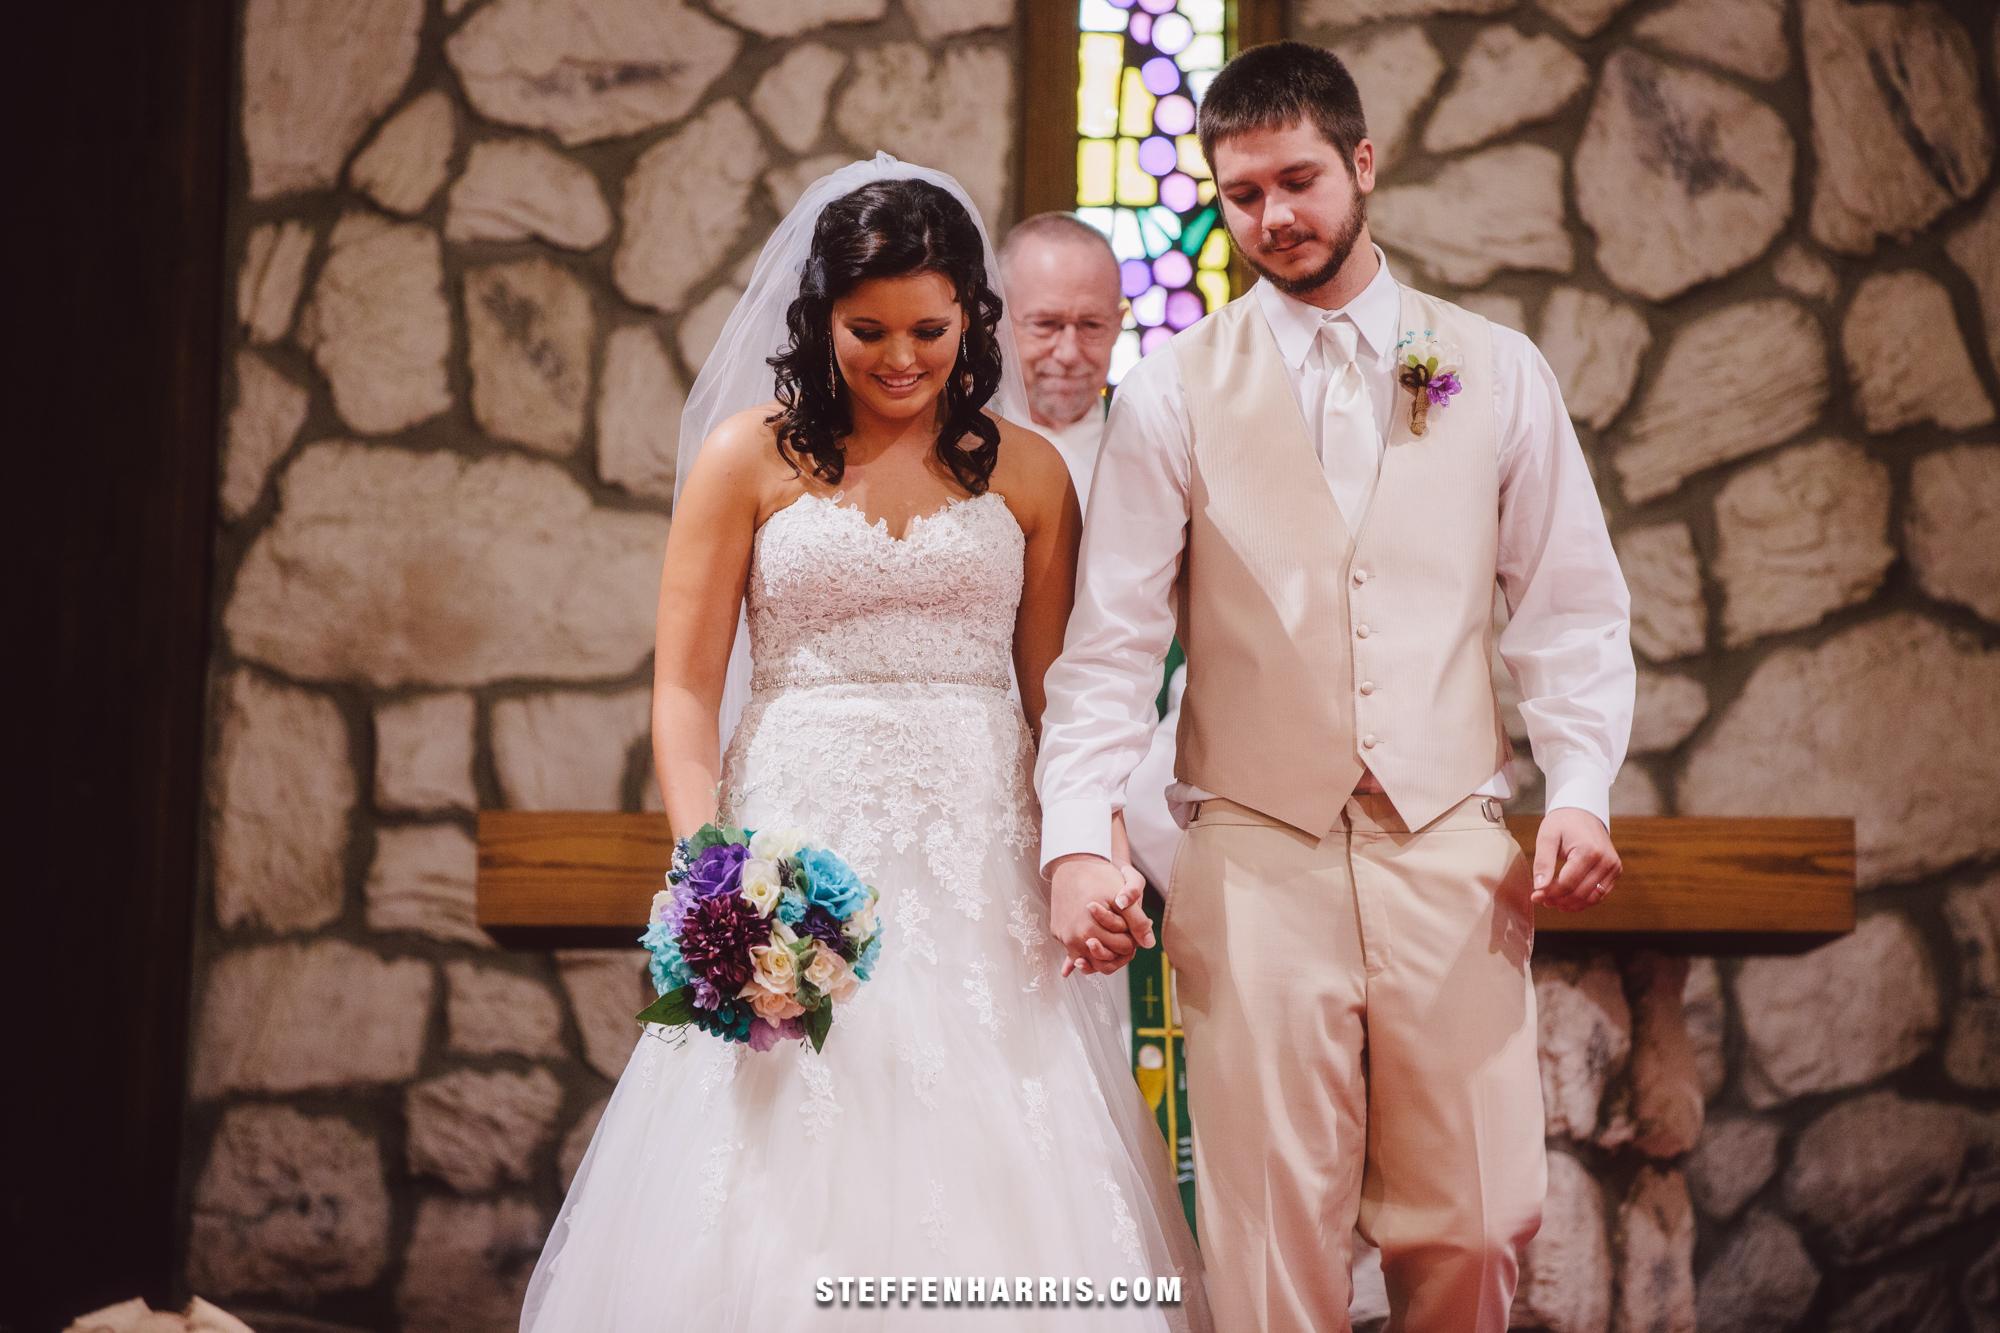 casey-aaron-salem-il-wedding-photography-28